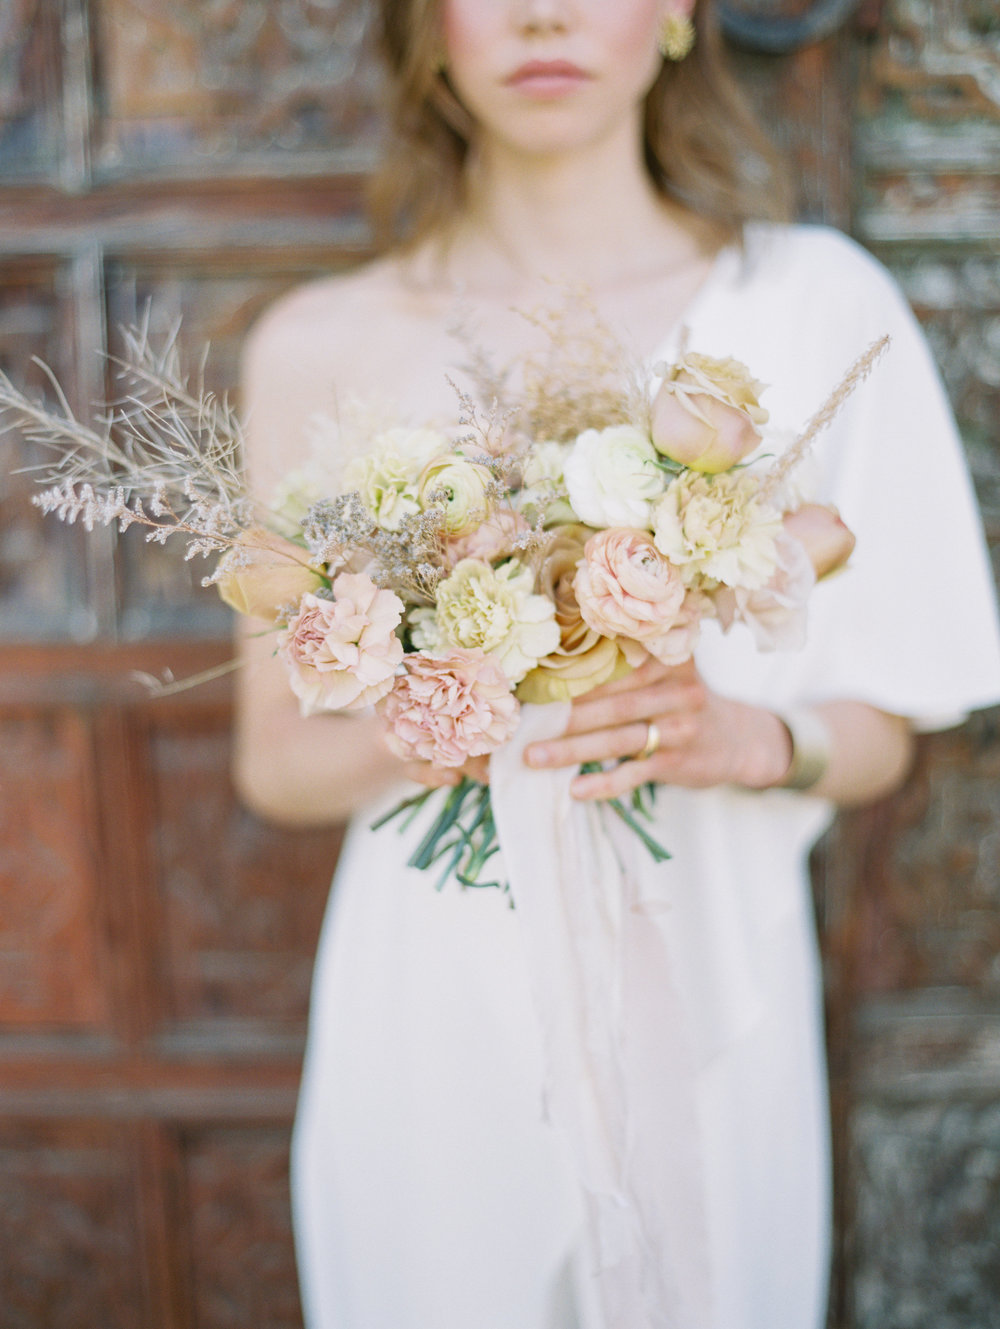 jessica-zimmerman-events-palm-springs-elopement-bouquet.JPG